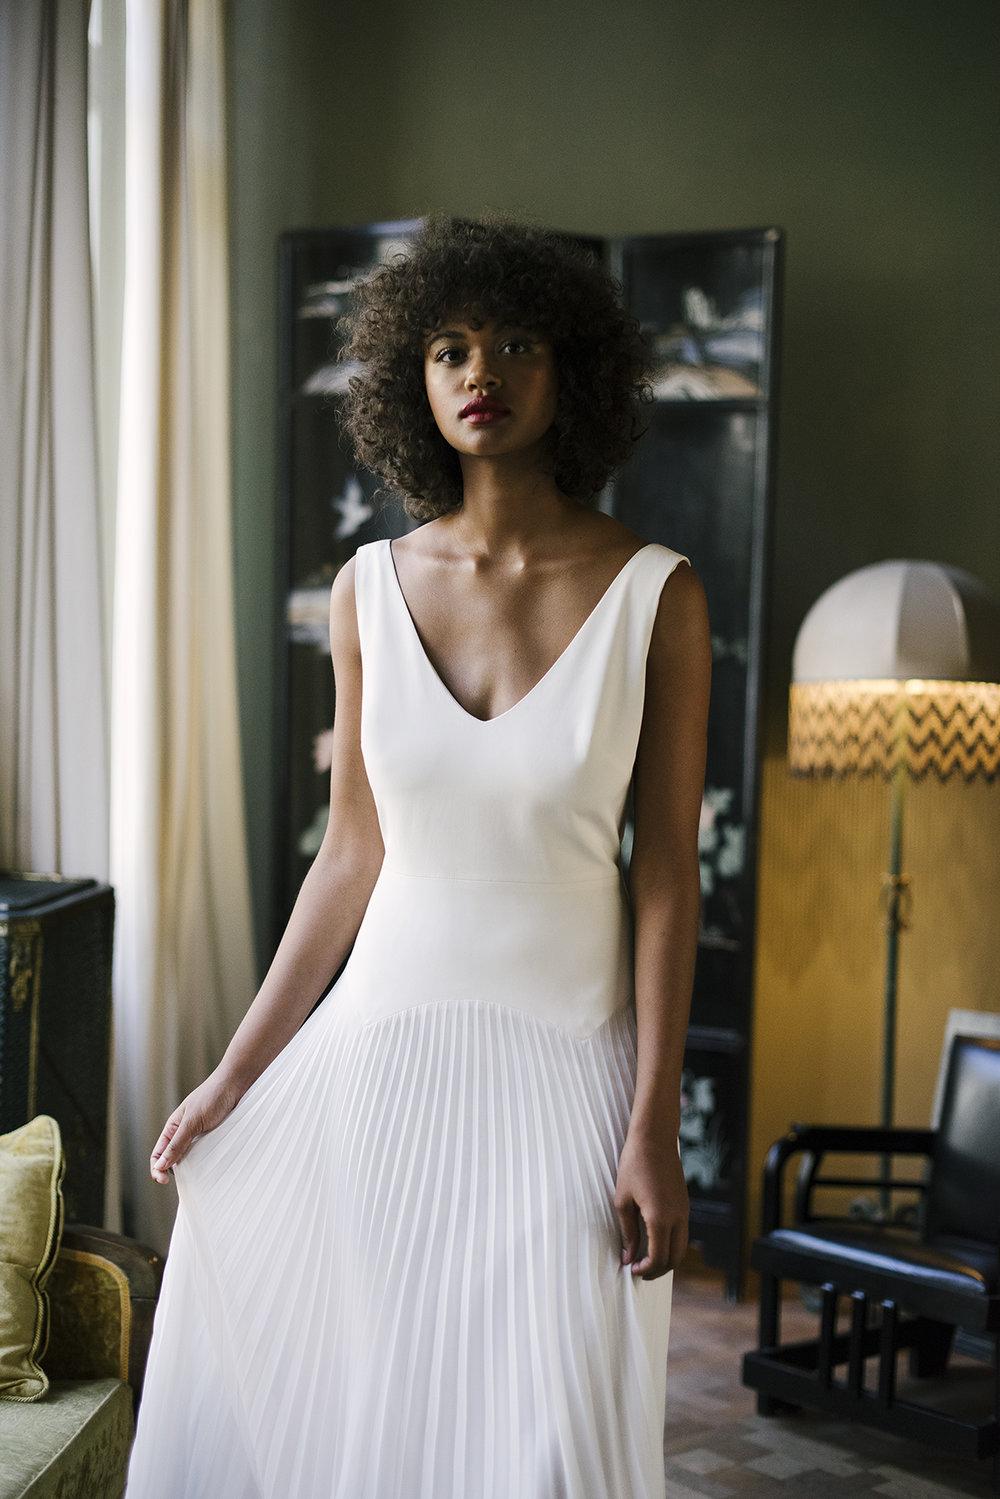 valentine-avoh-robe-mariee-grace-wedding-dress-bruxelles-photo-elodie-timmermans-6.jpg